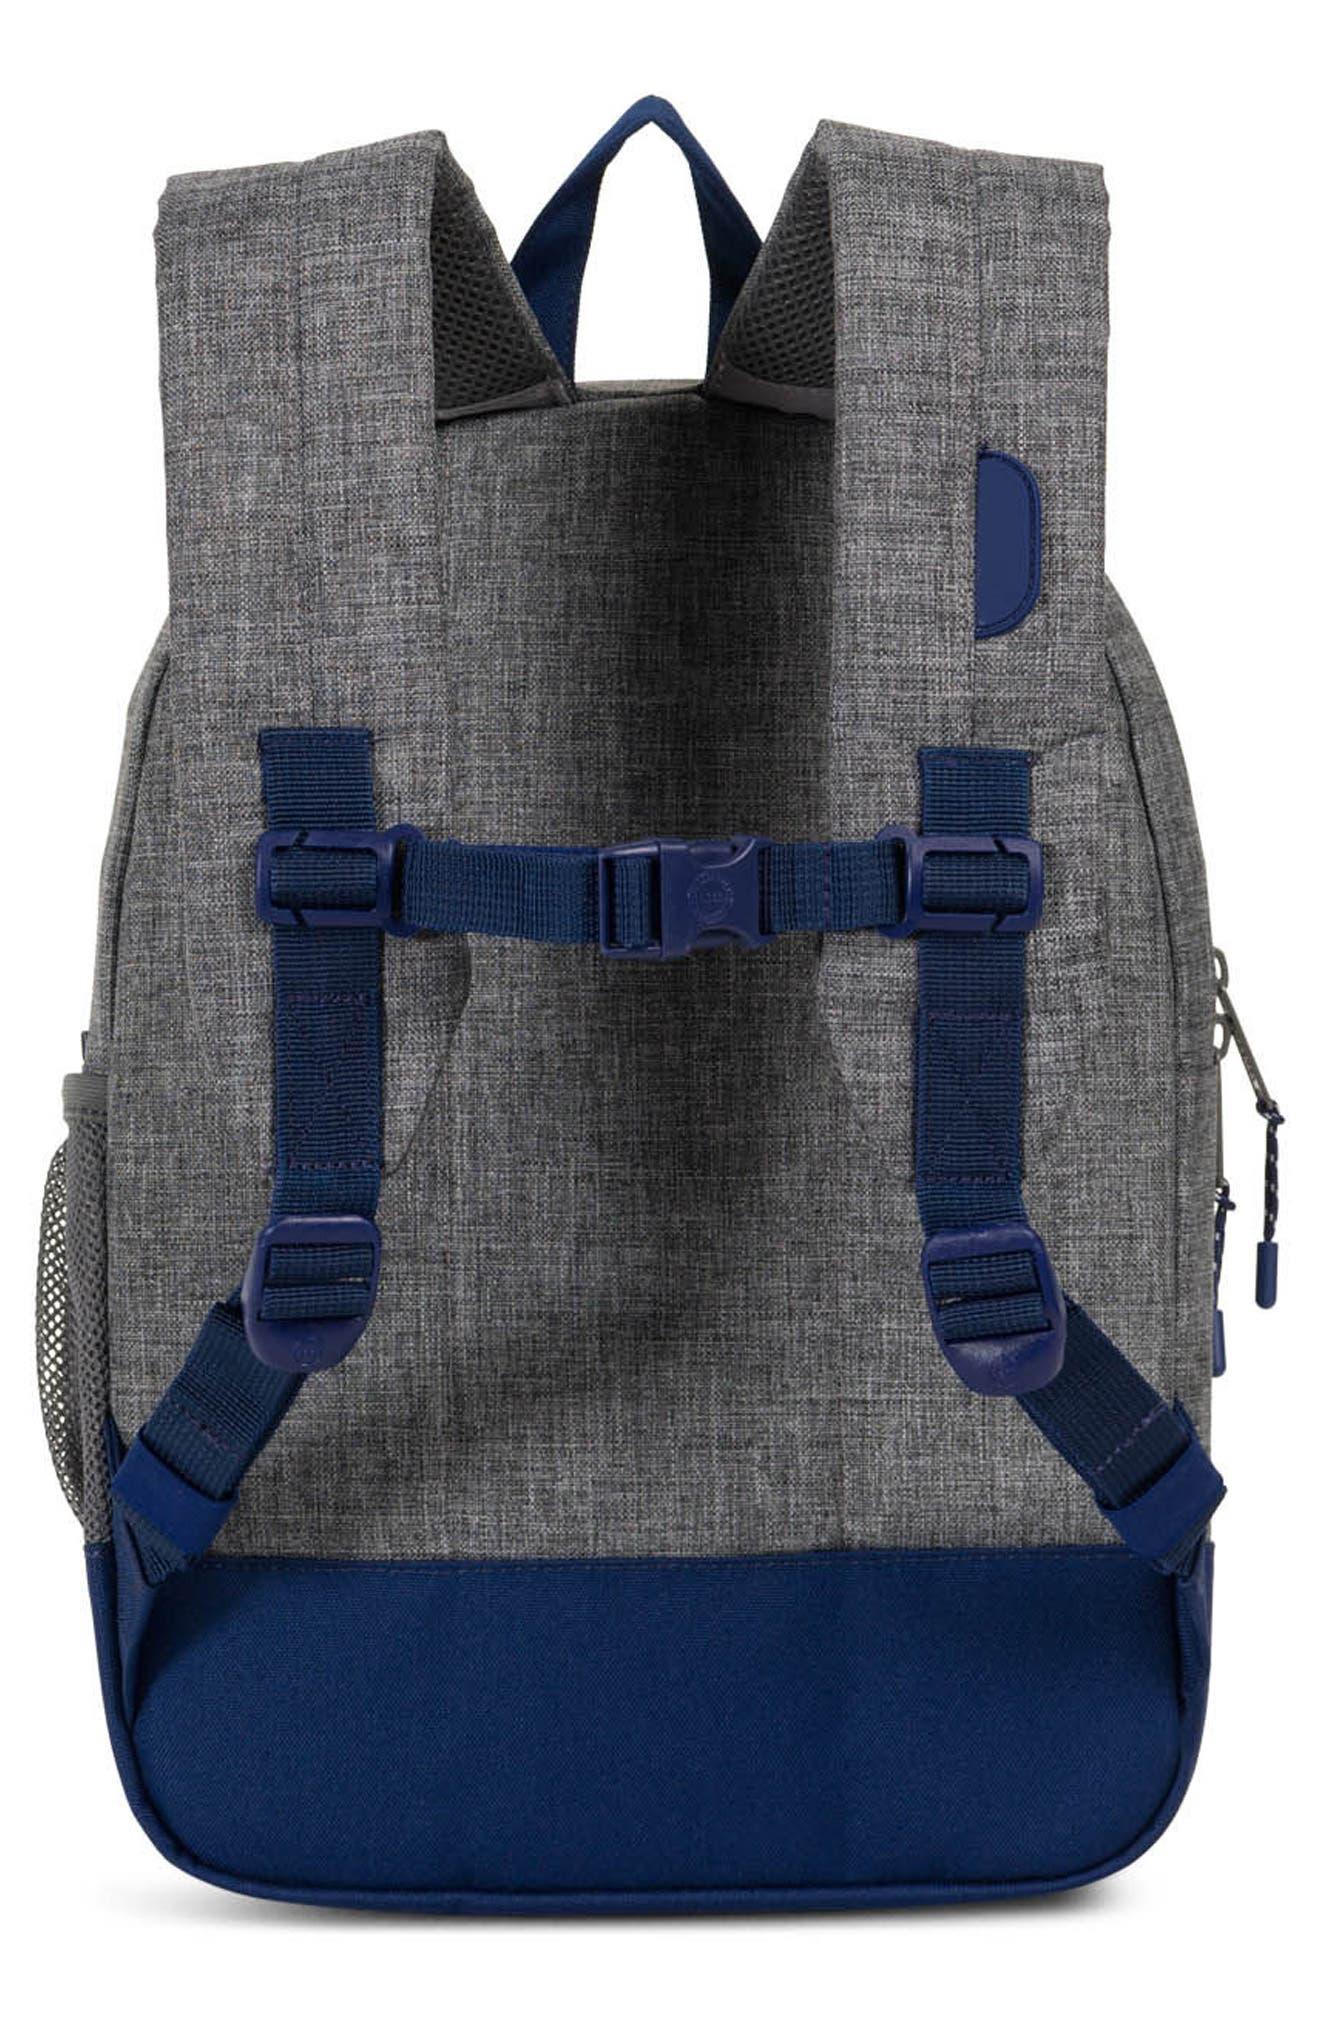 Heritage Backpack,                             Alternate thumbnail 4, color,                             Raven/ Black